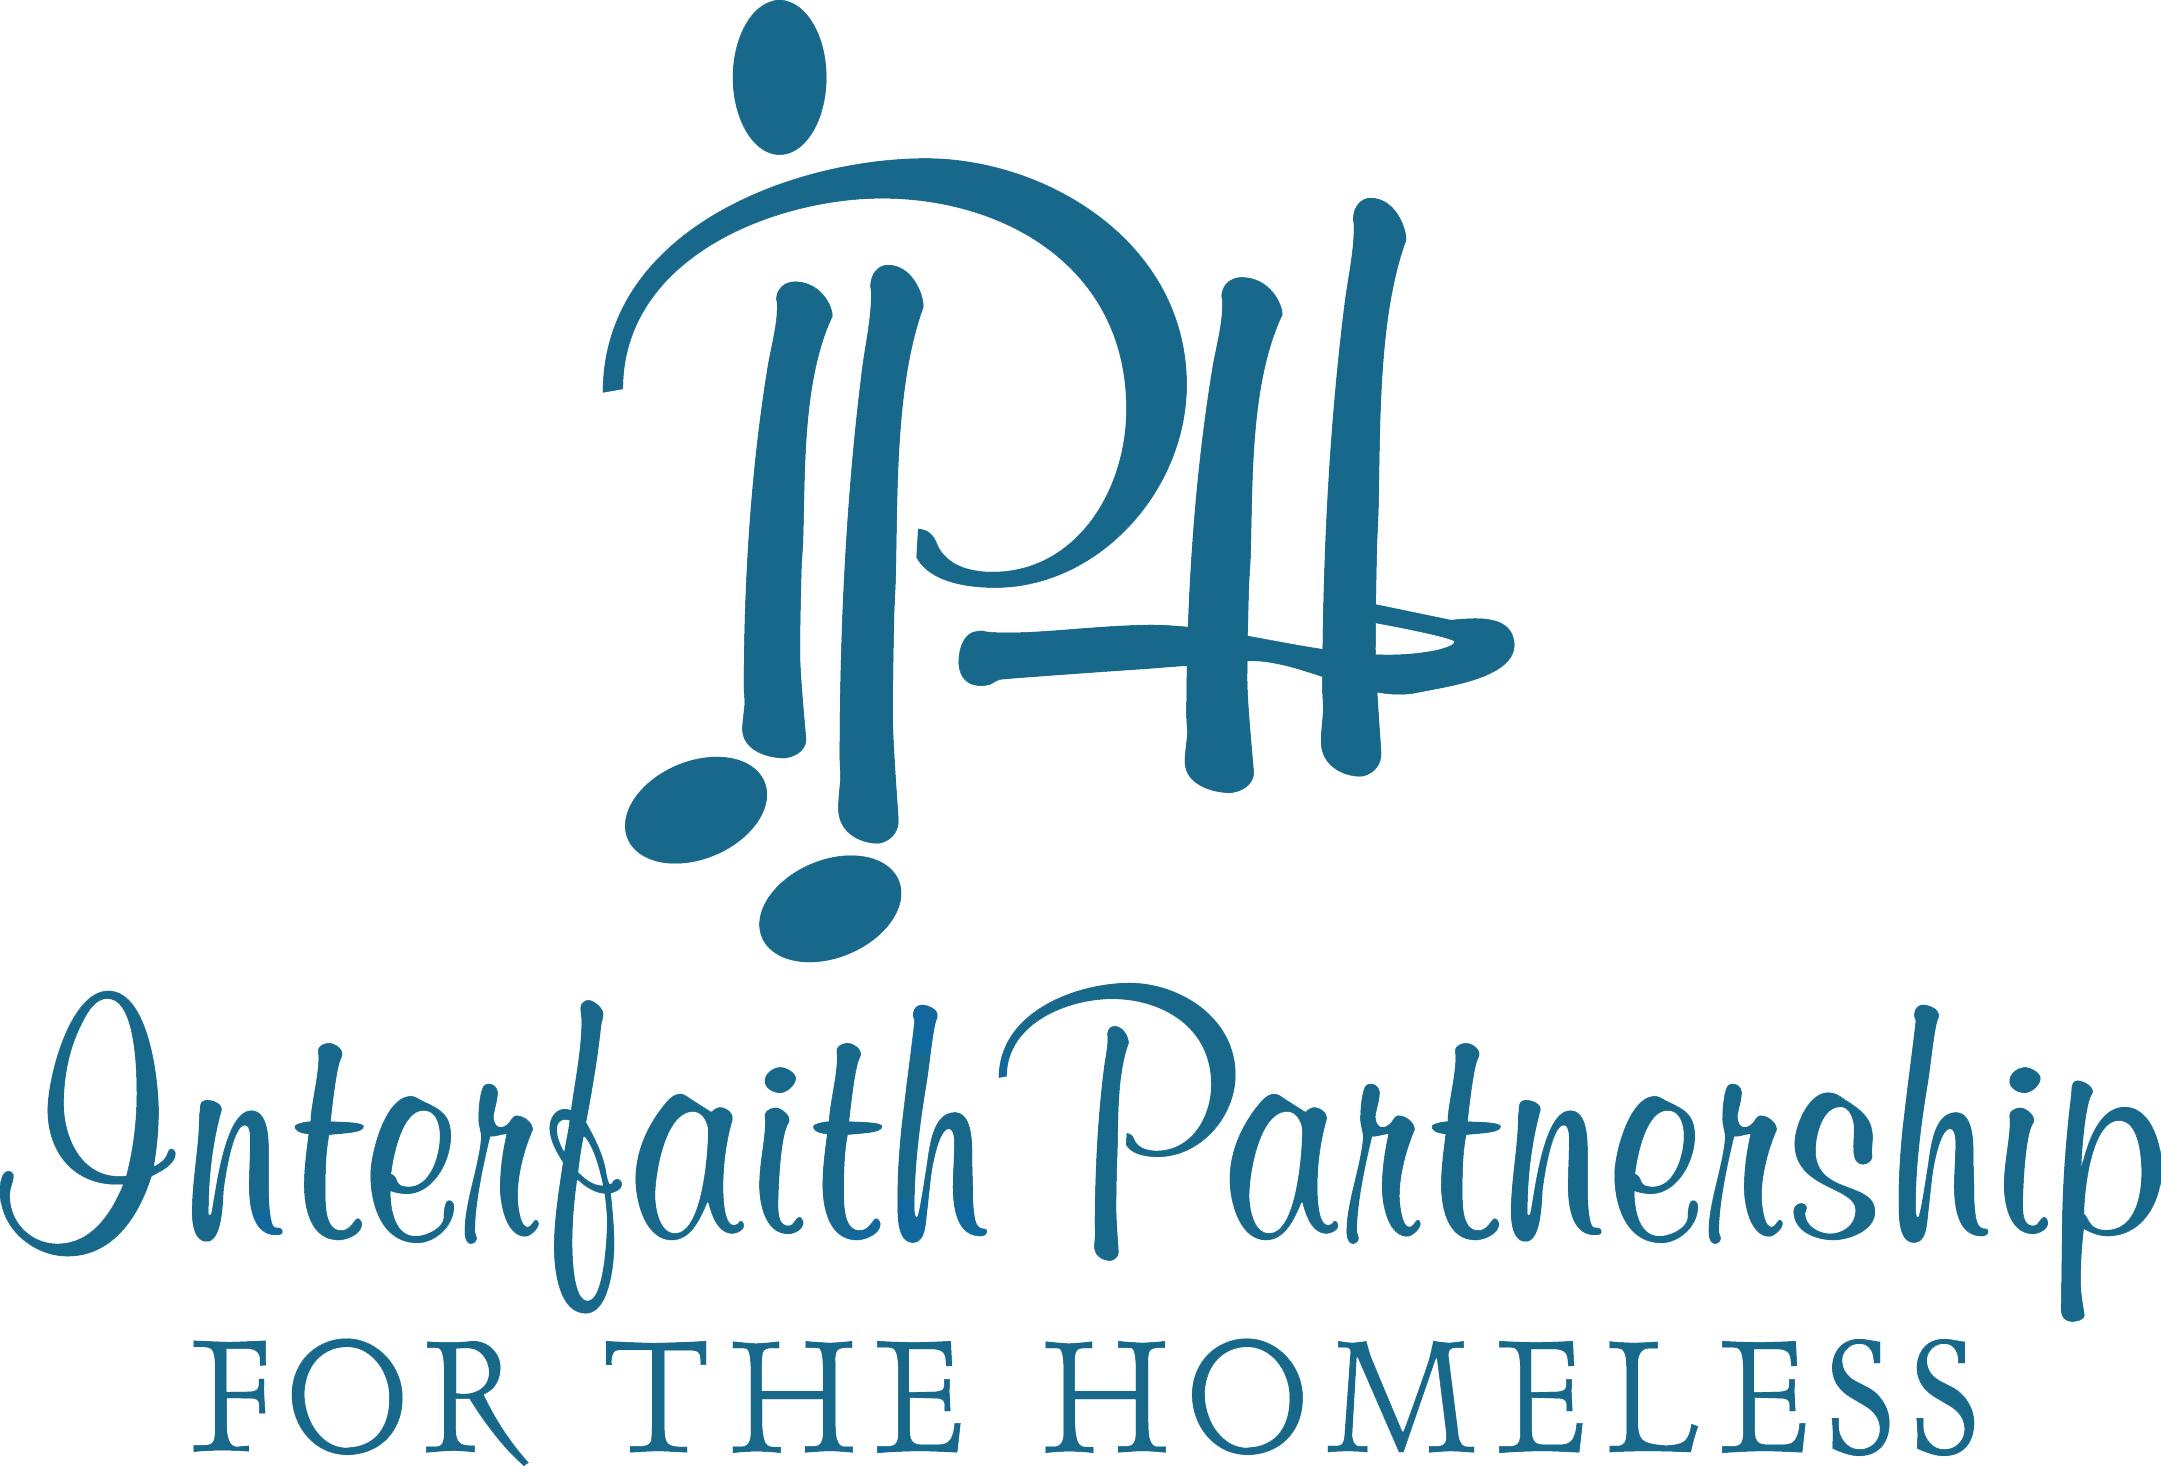 IPH_High_Res_Blue logo.jpg